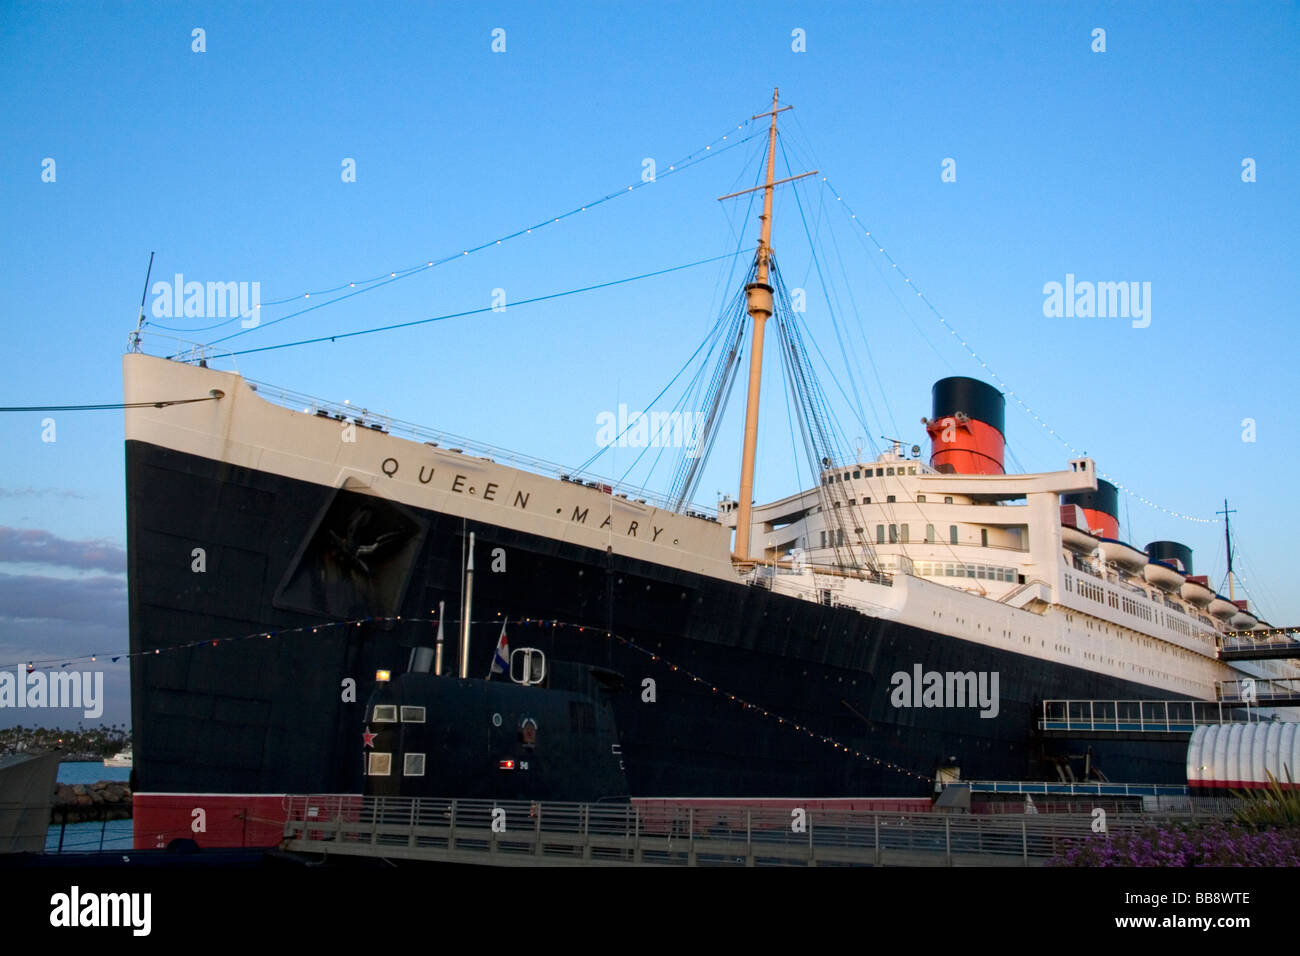 Die Queen Mary Museum Und Hotel Schiff Am Long Beach California Usa